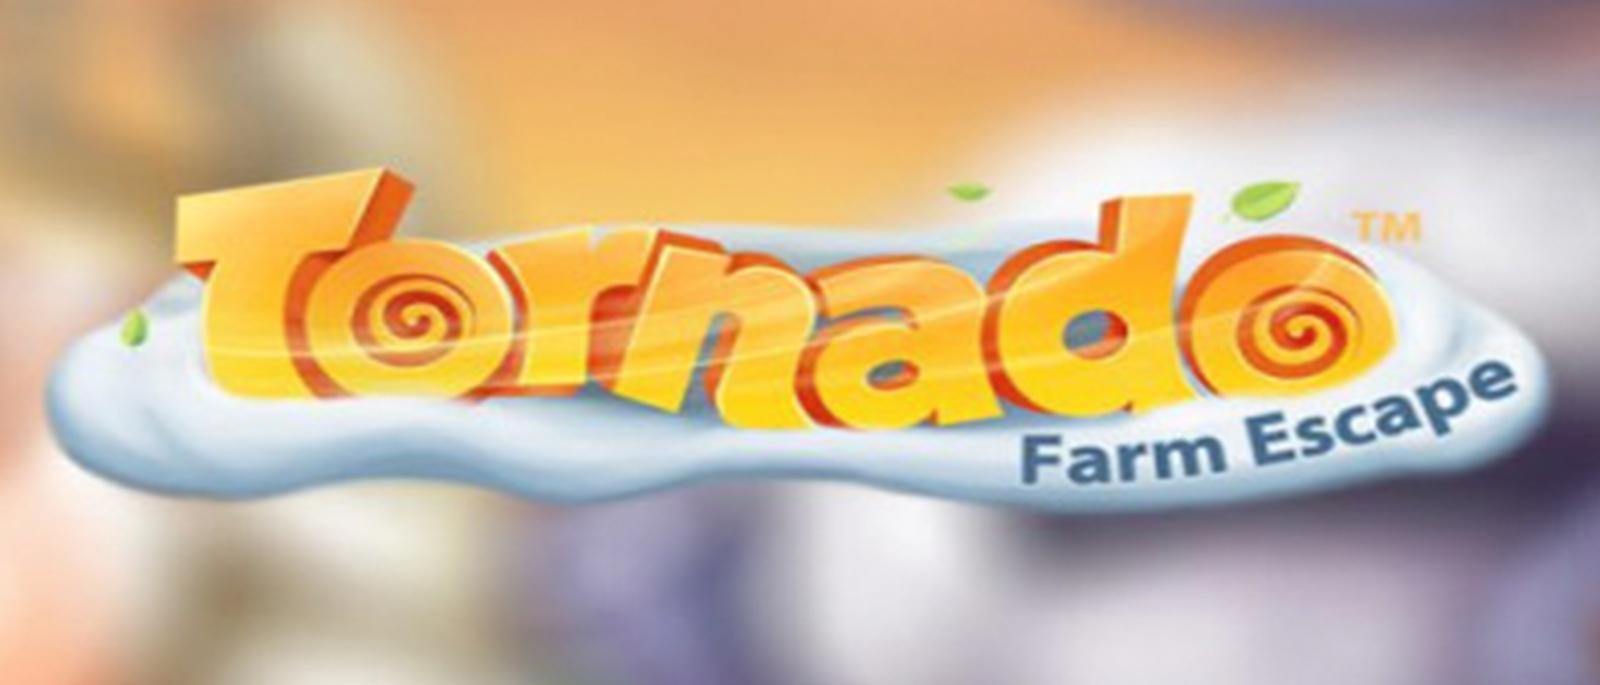 Betfair poker tragaperra Tornado Farm Escape-359688